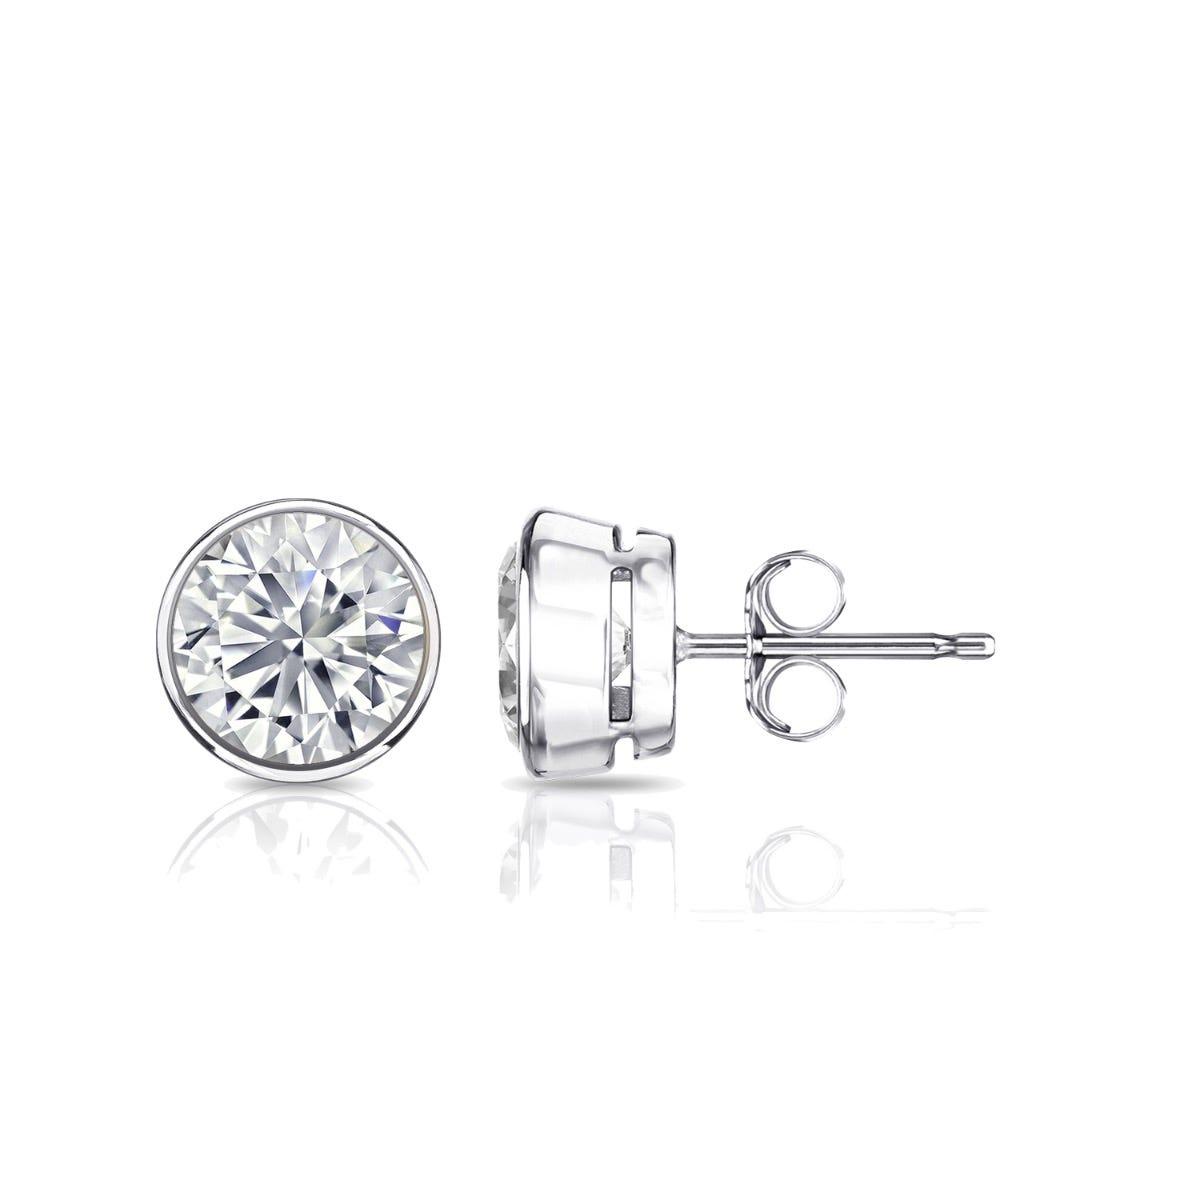 Diamond Round Bezel-Set 1ctw. Solitaire Stud (IJ-I2) Earrings in Platinum